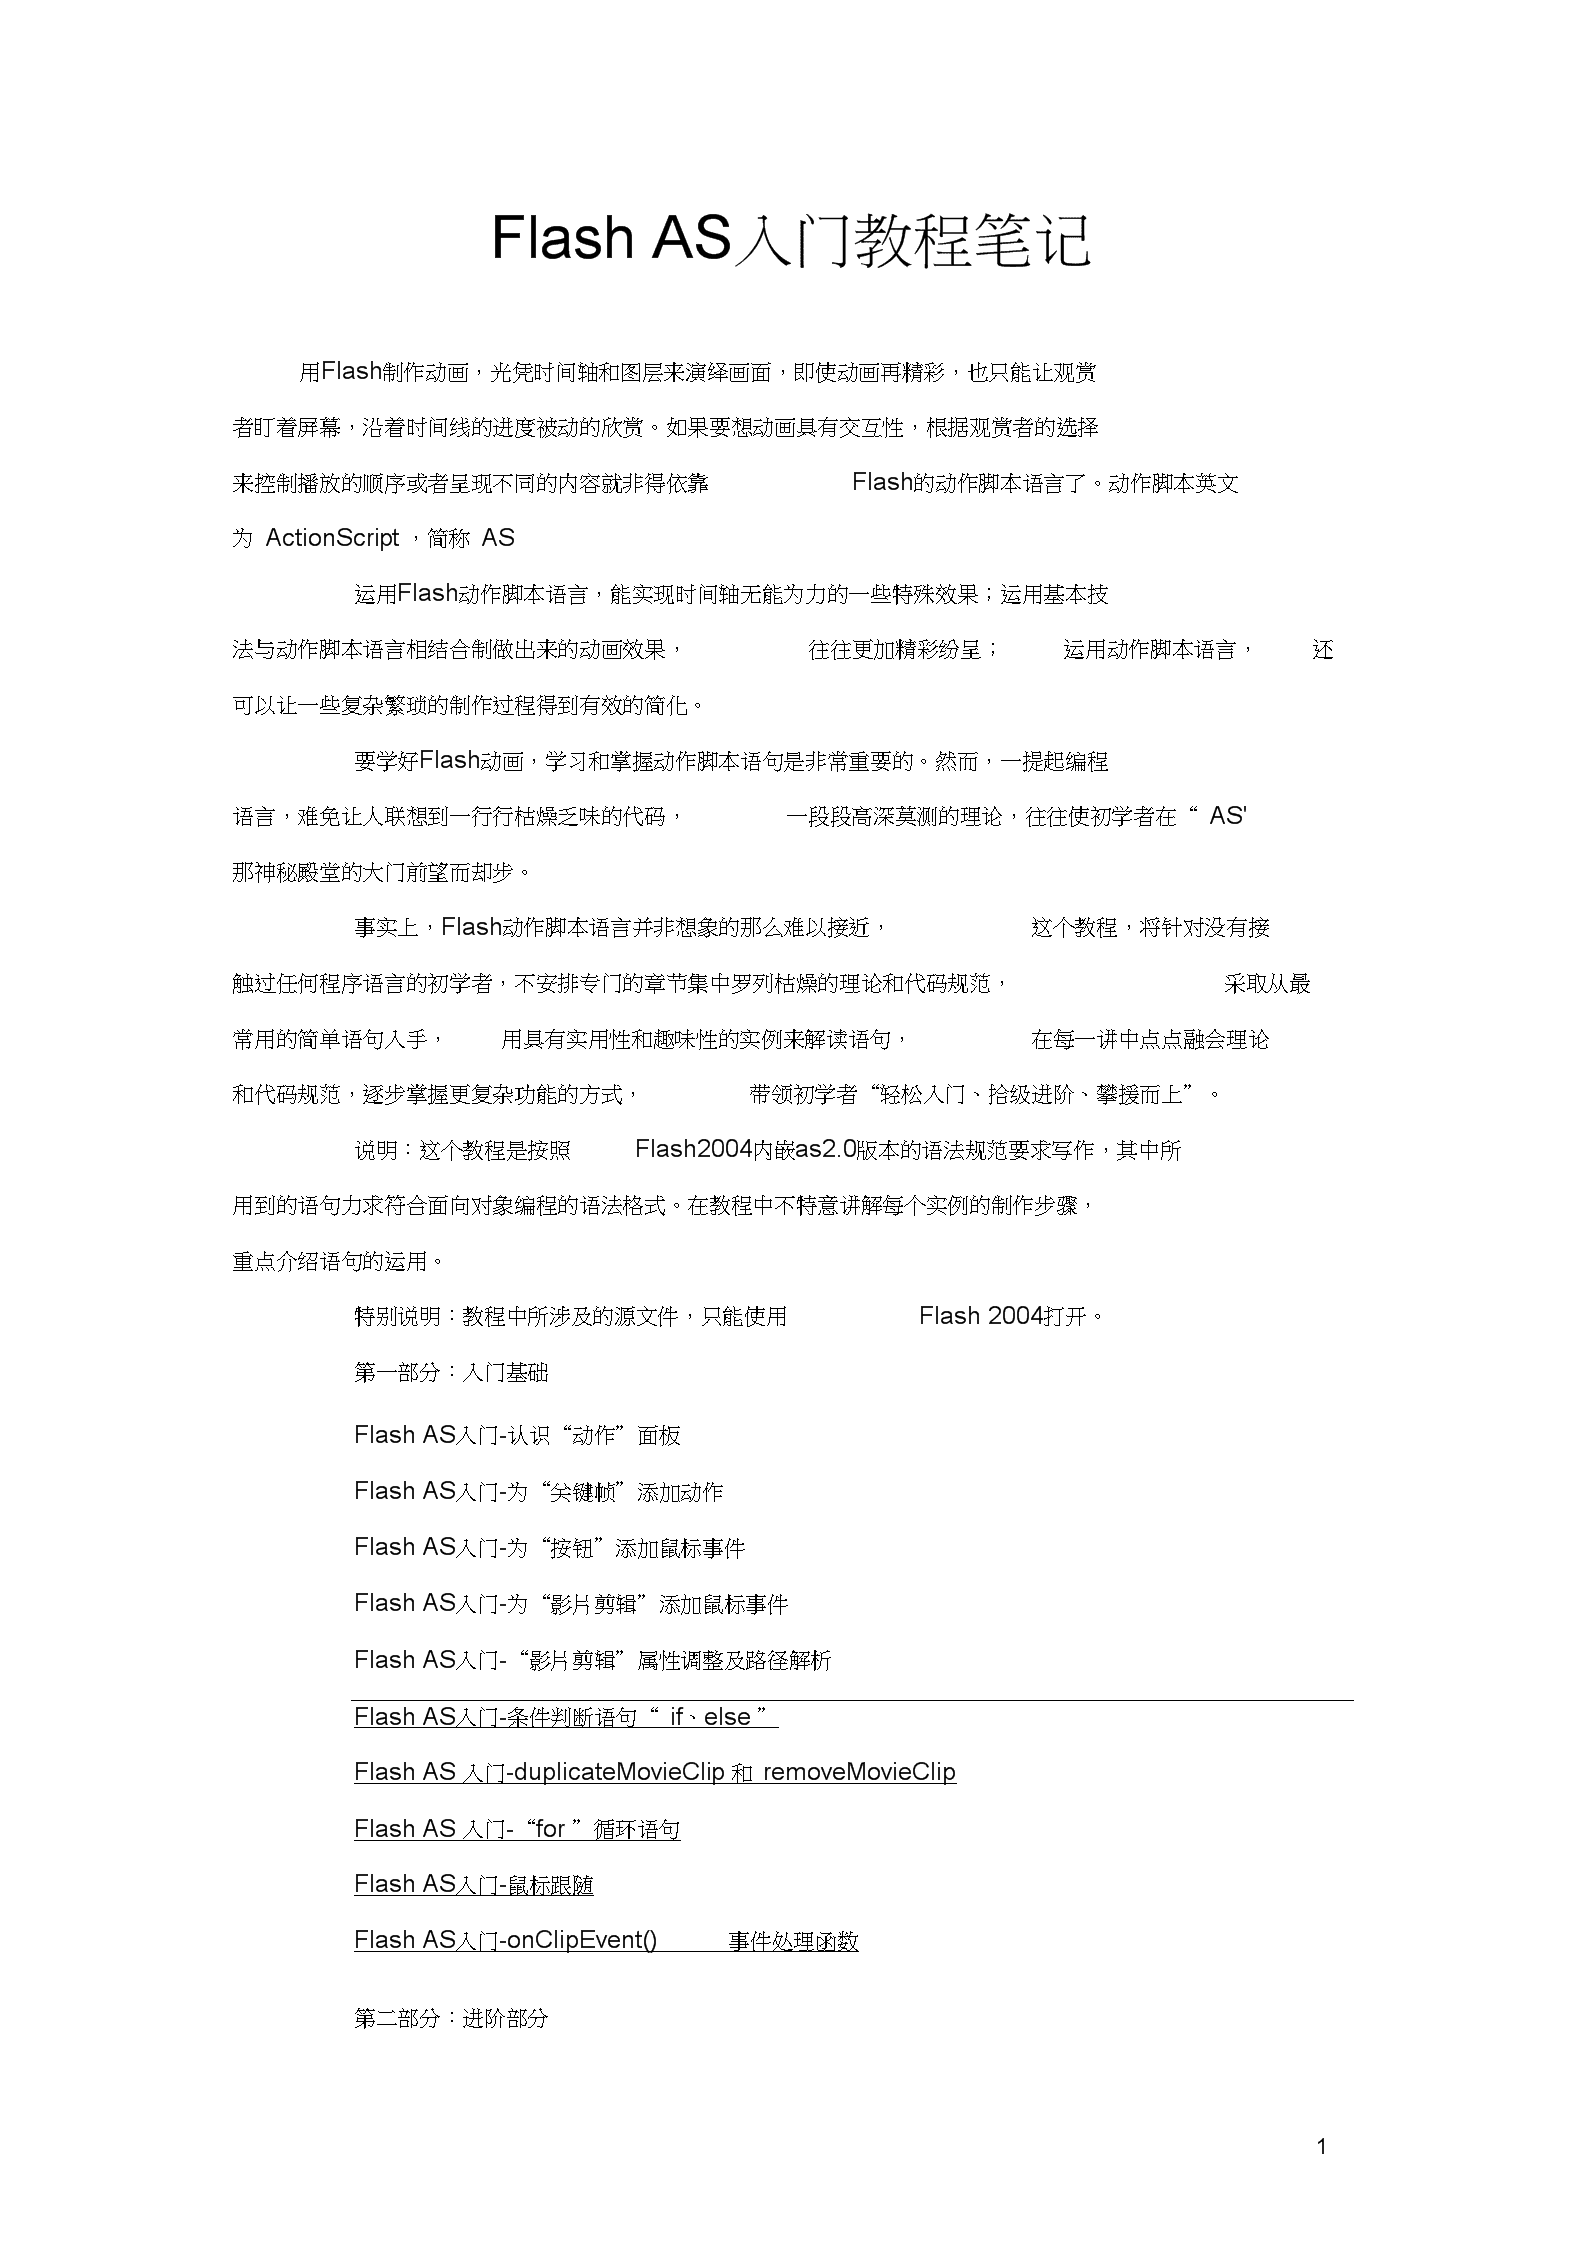 FlashAs入门教程学习笔记.docx